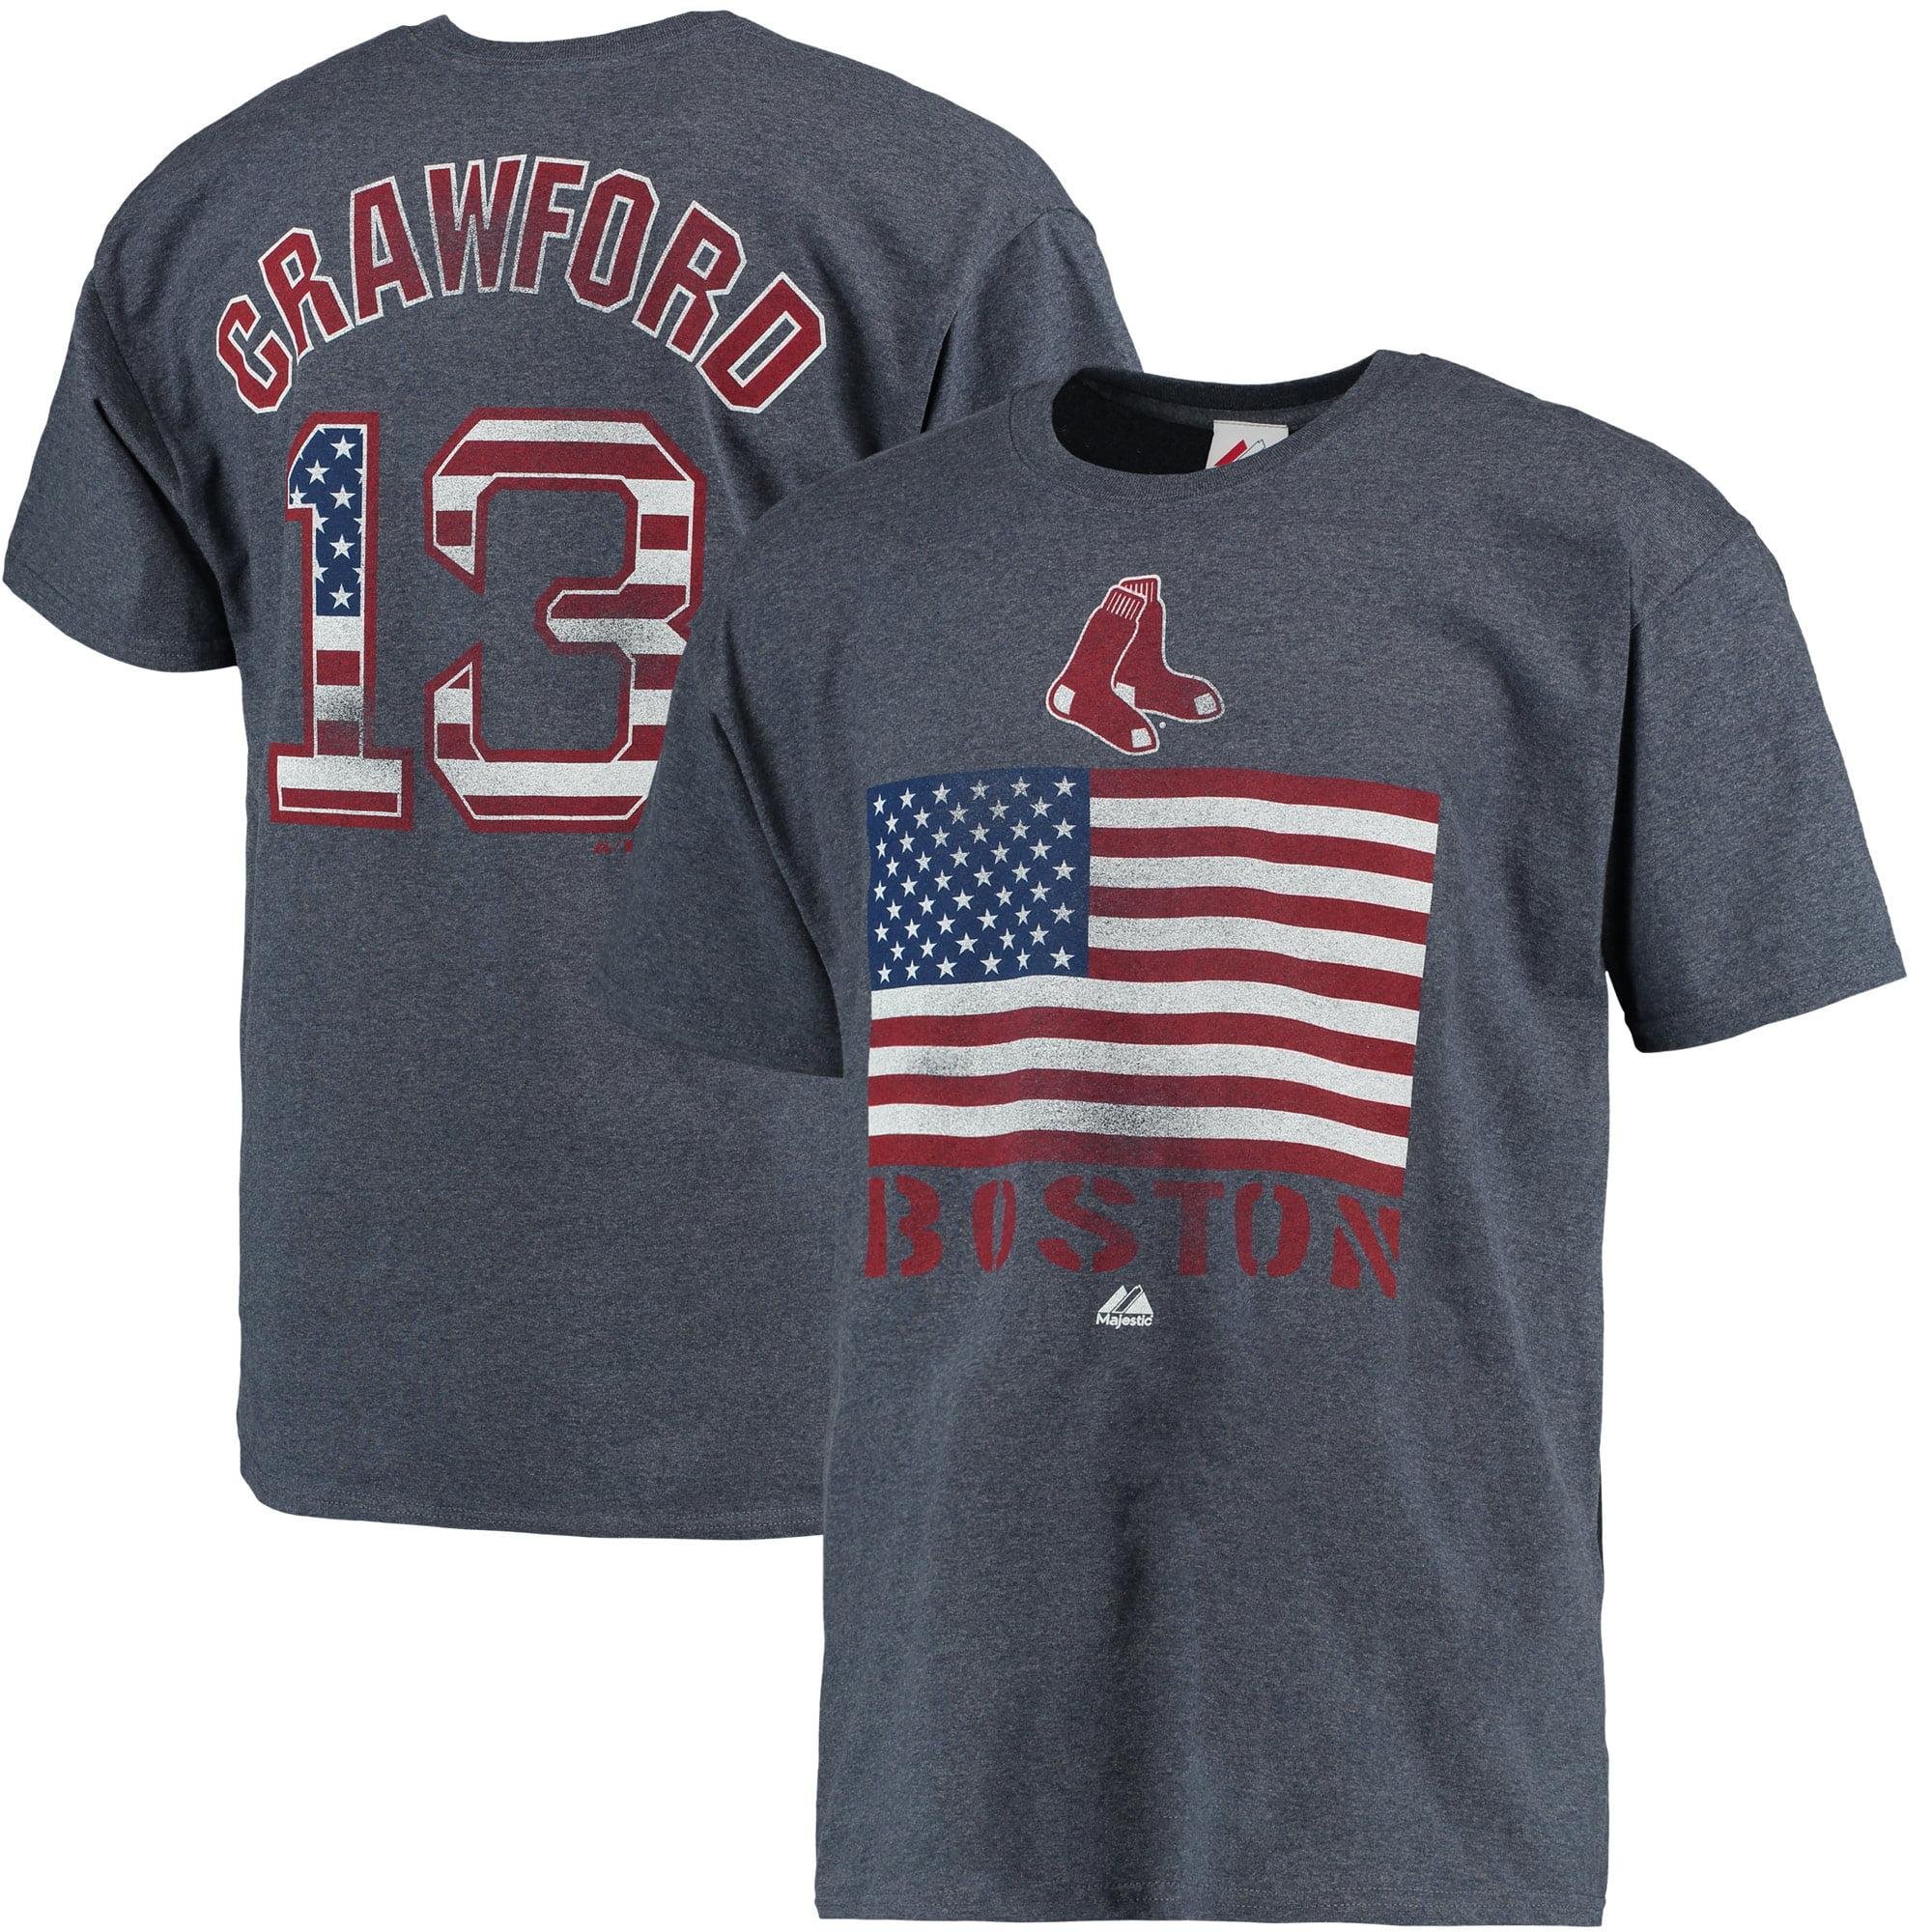 Carl Crawford Boston Red Sox Majestic Threads Stars & Stripes T-Shirt - Heathered Navy